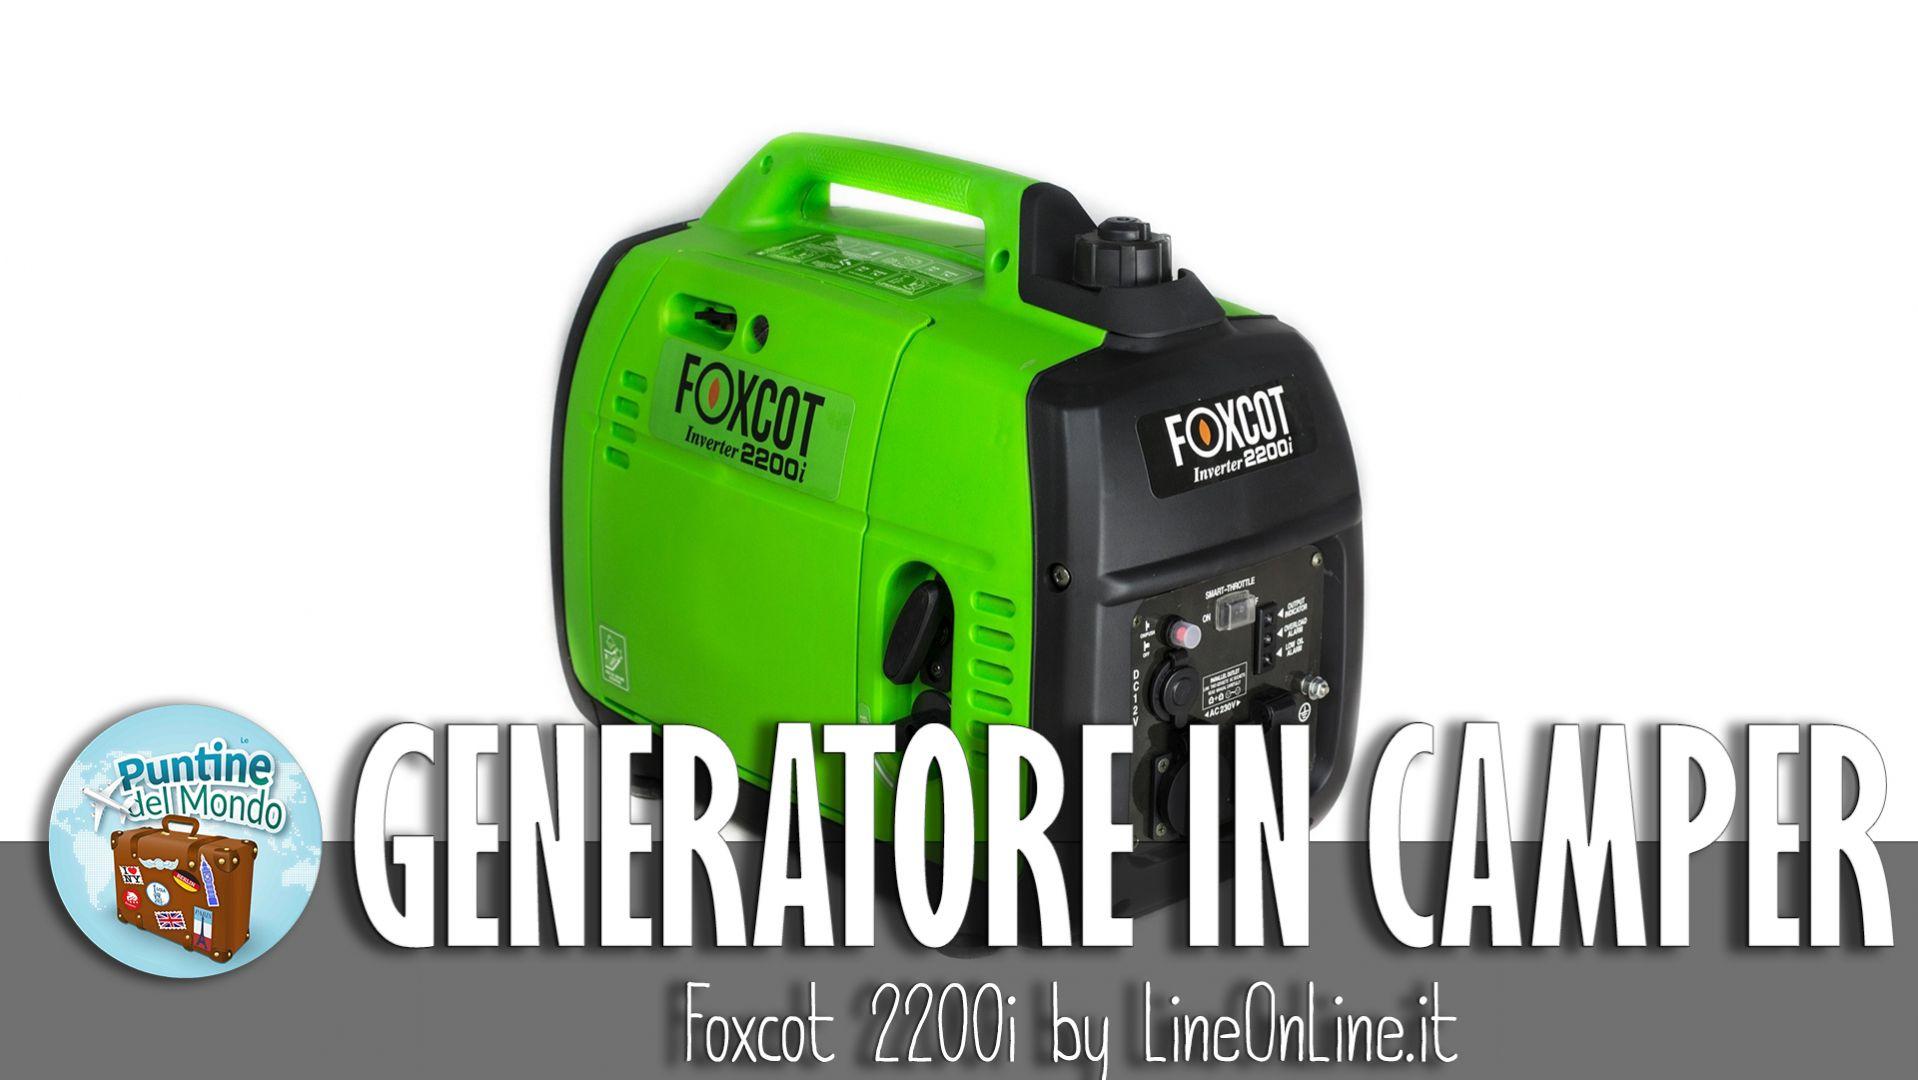 Generatore silenzioso portatile 2.2kw per camper by Lineonline